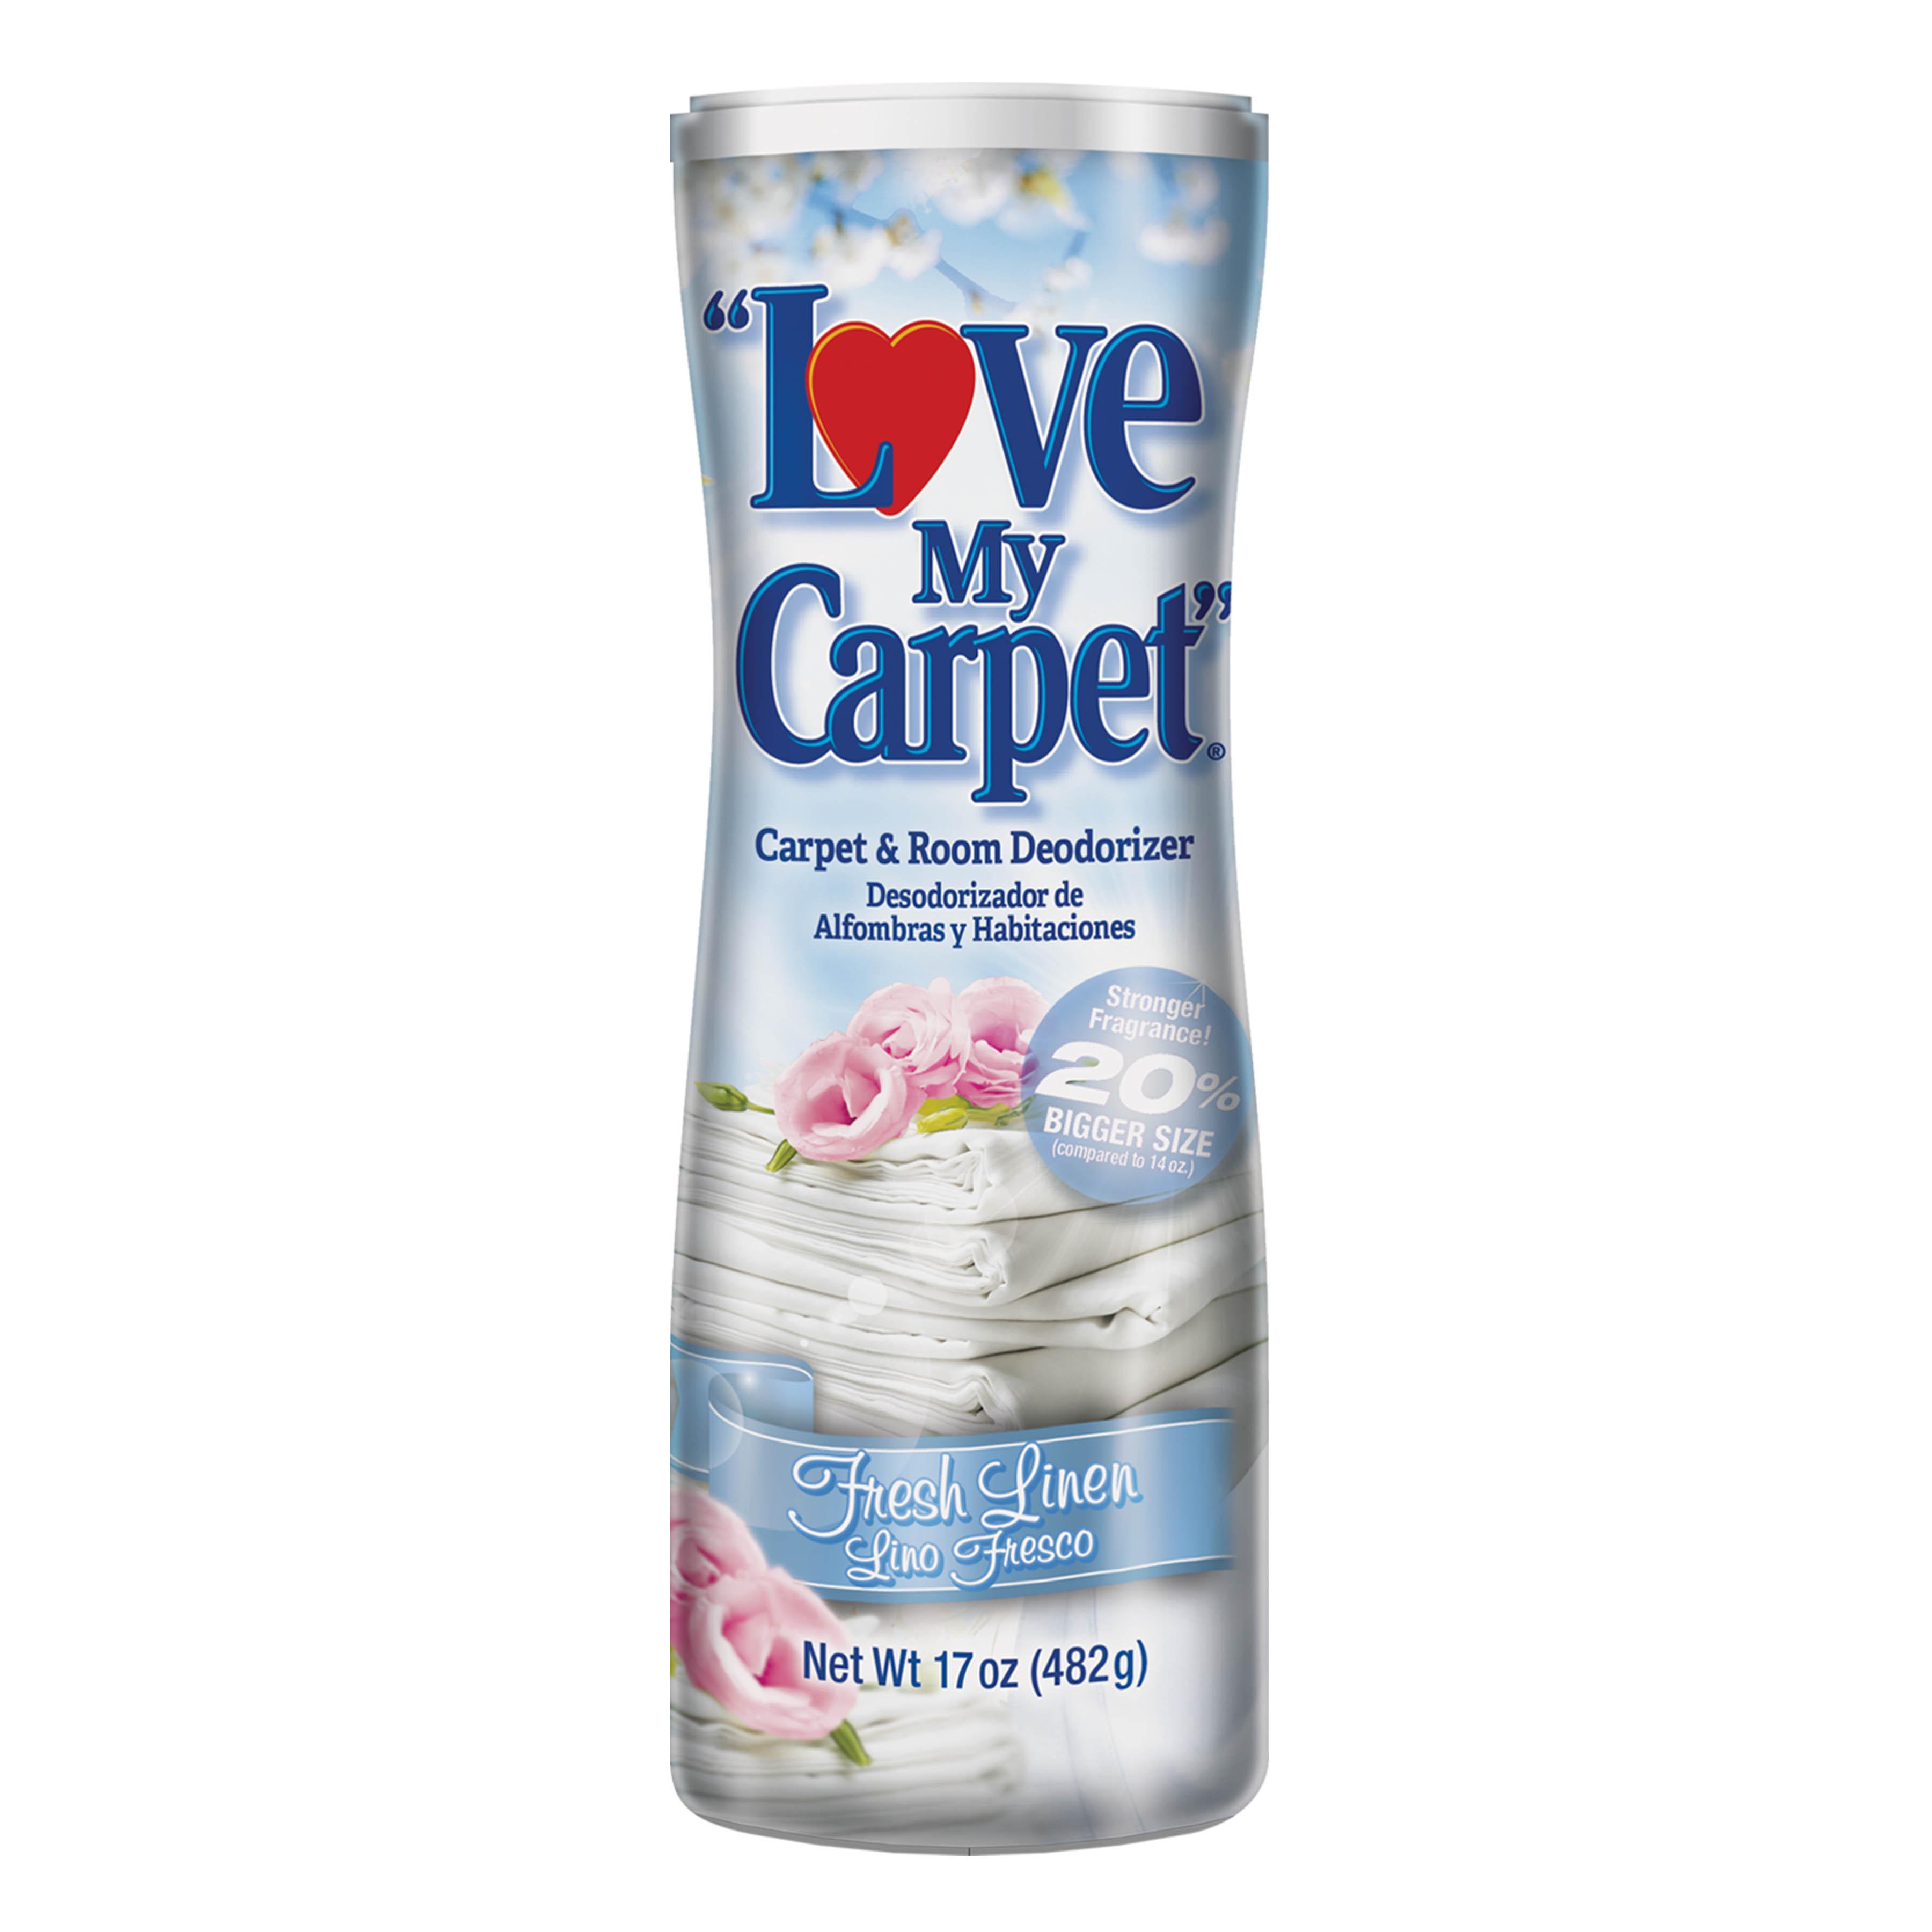 Love My Carpet, Fresh Linen